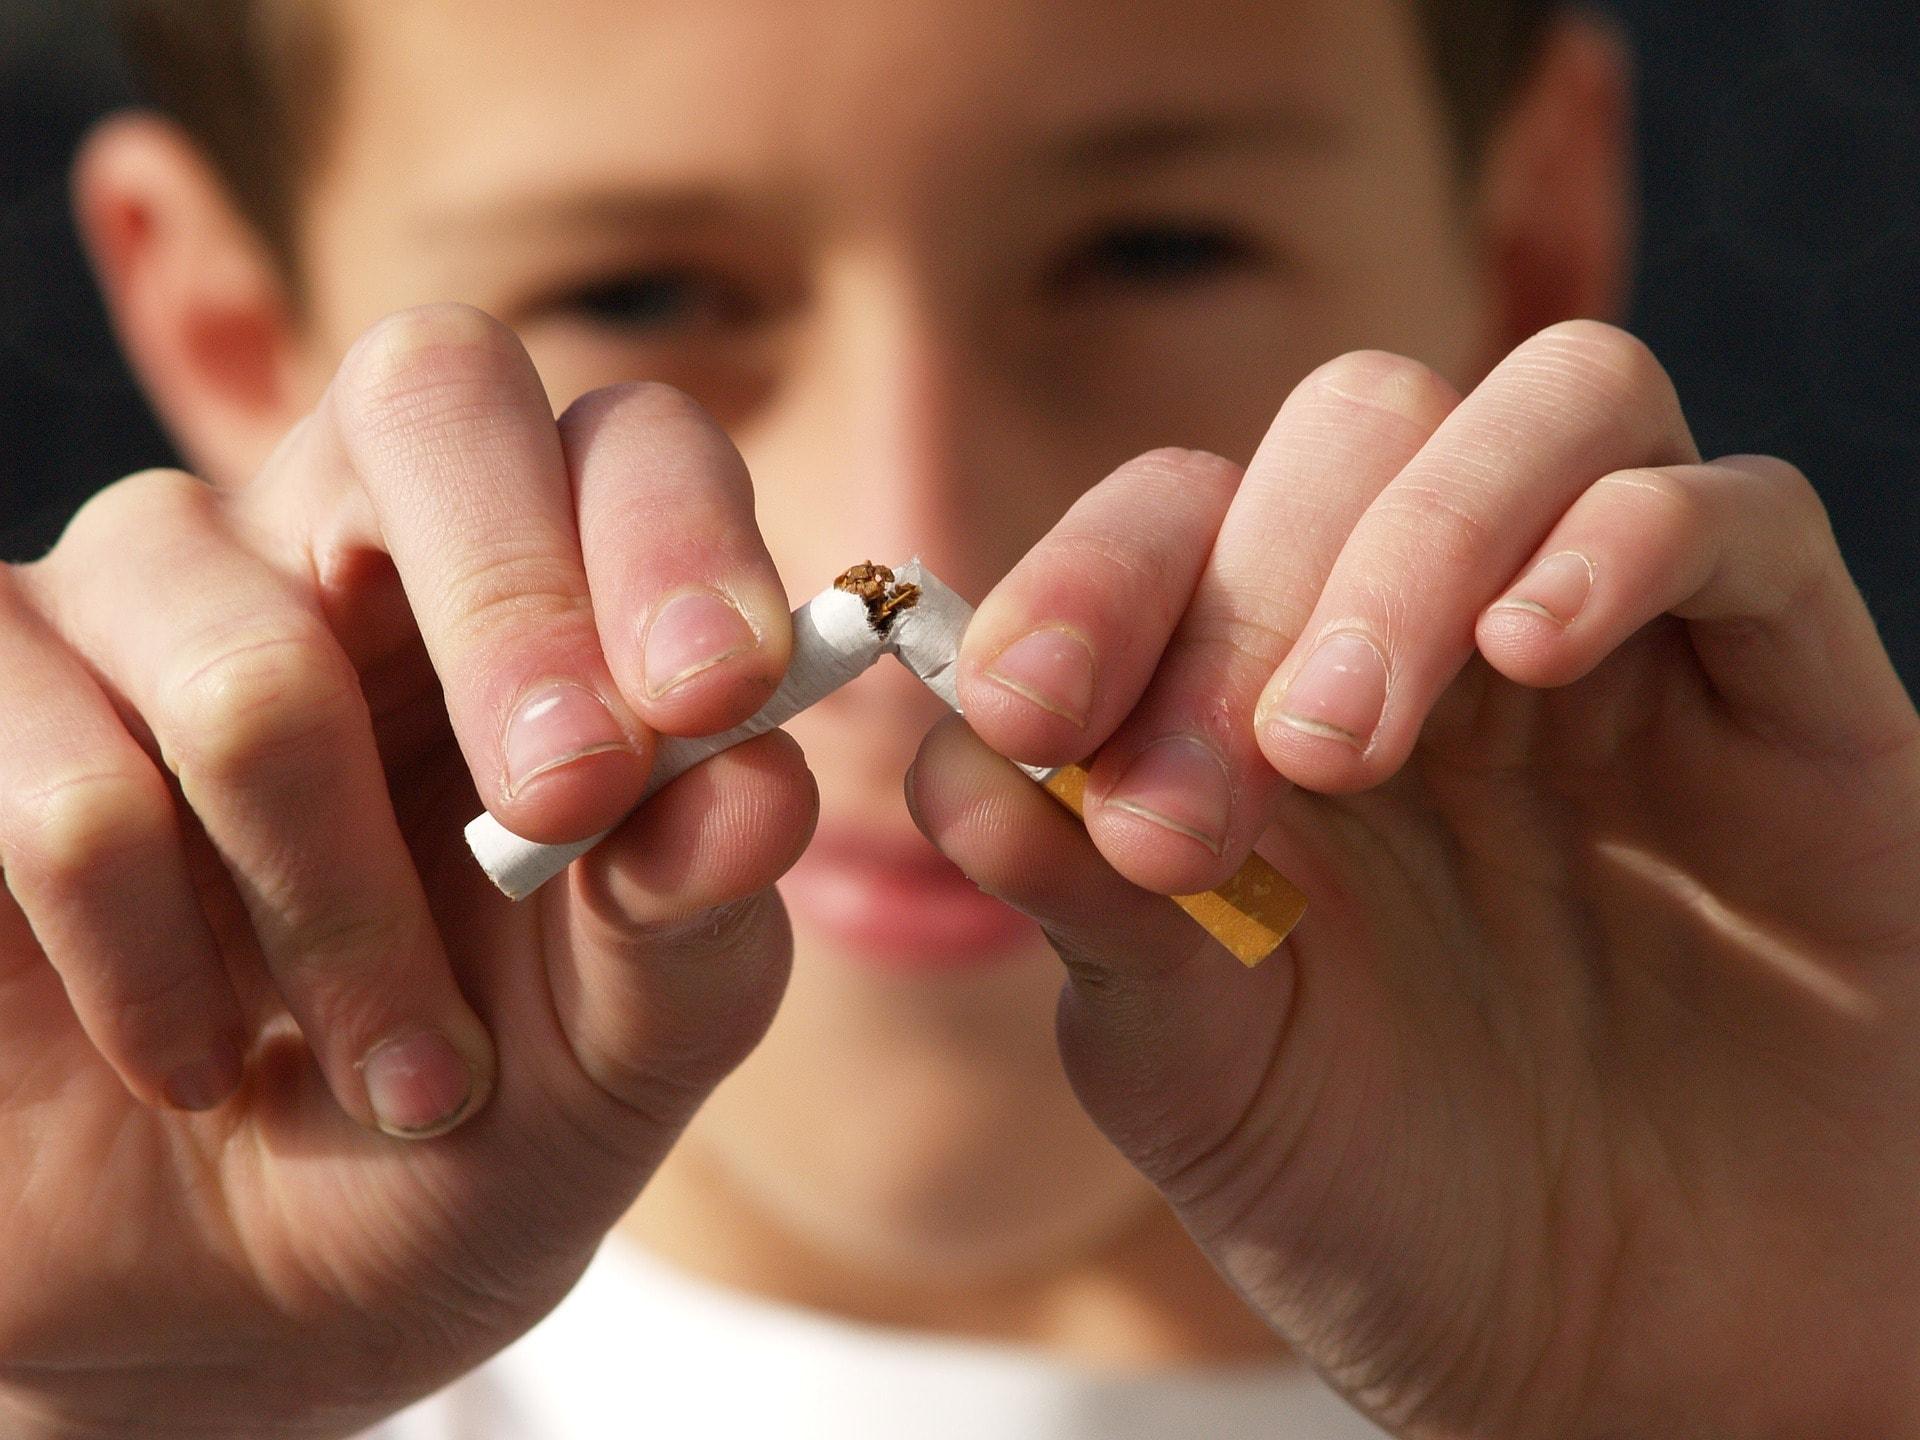 El peligro de fumar marihuana